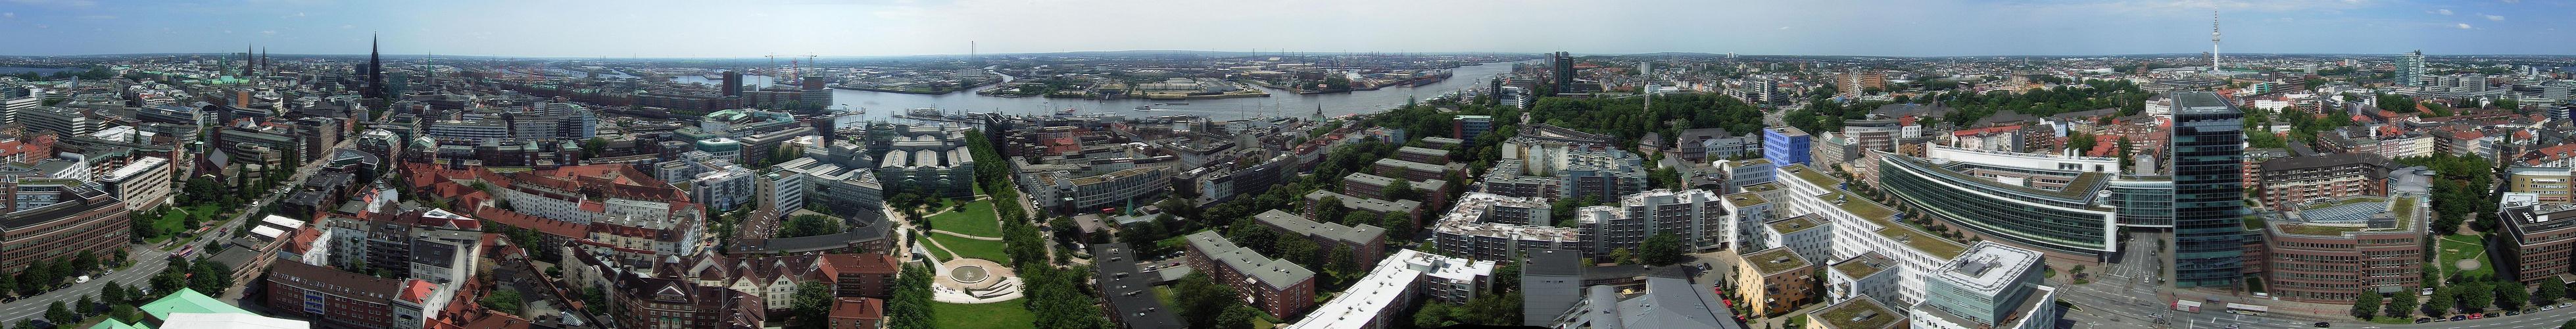 Panorama vom Michel